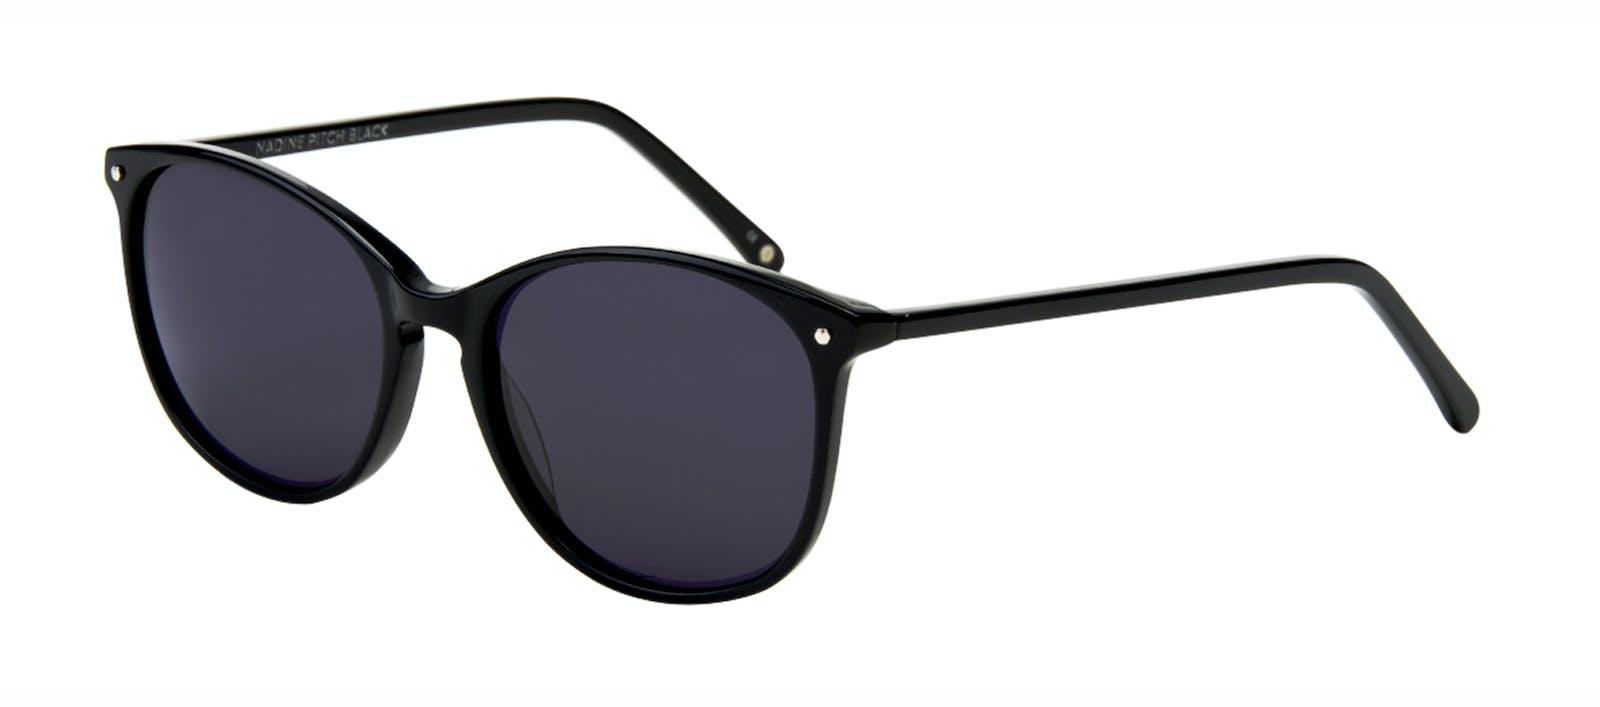 Affordable Fashion Glasses Rectangle Square Round Sunglasses Women Nadine  Pitch Black Tilt 61d500448